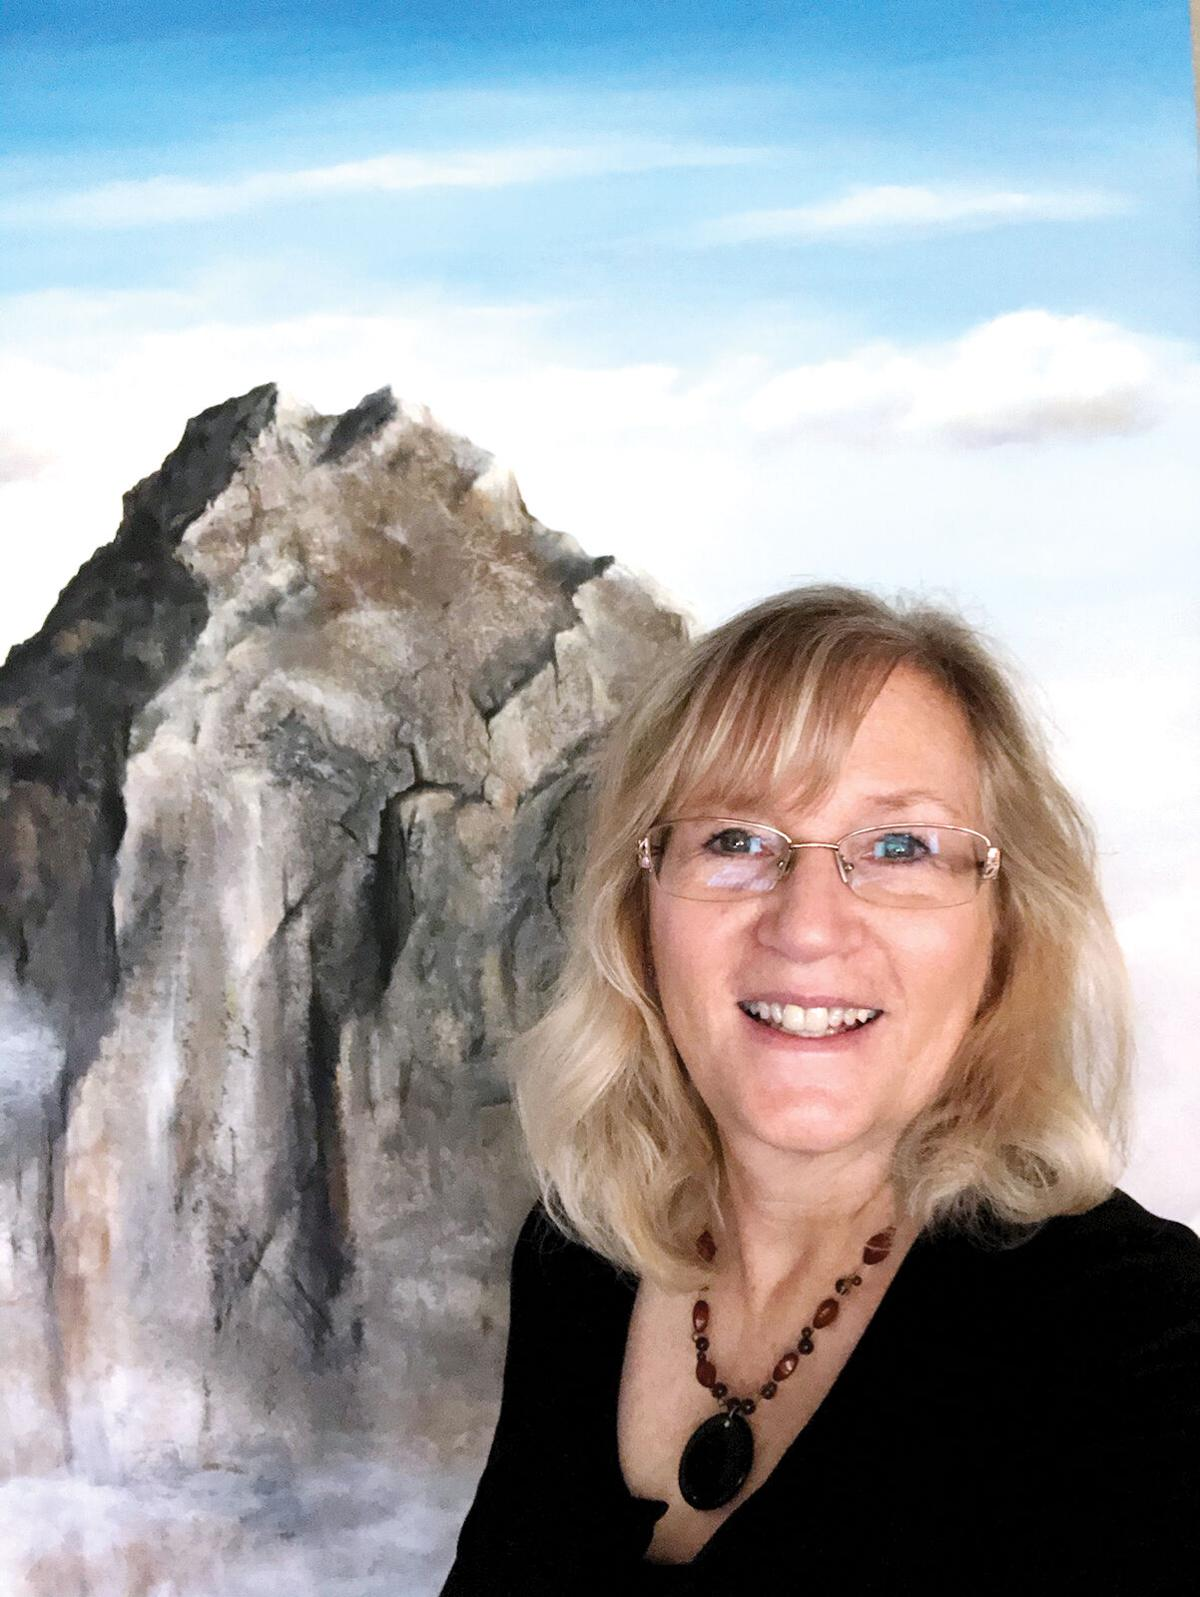 Linda Leichtfuss